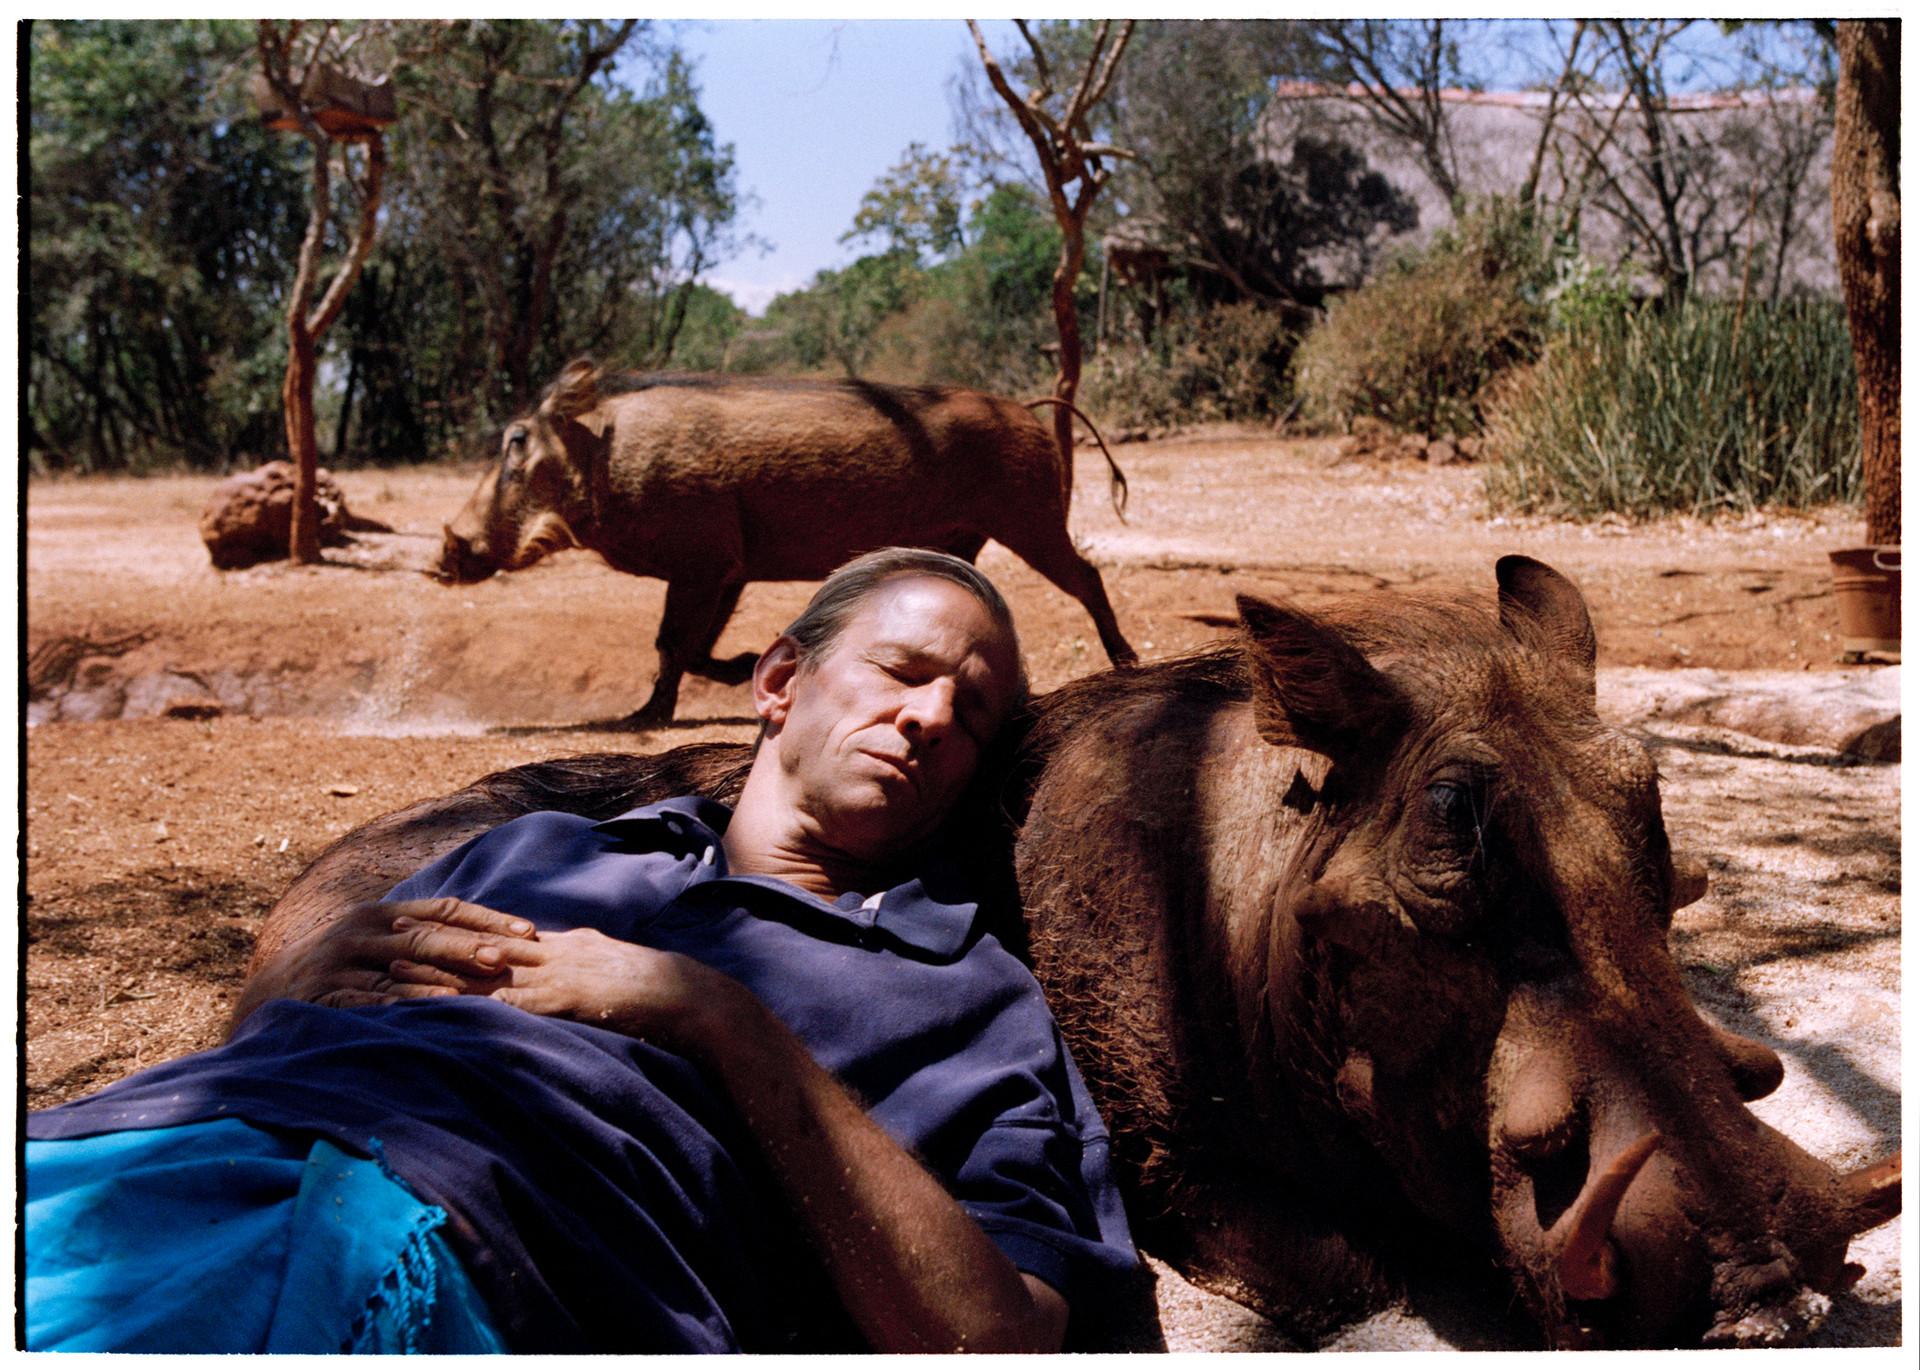 Peter Beard resting on hog